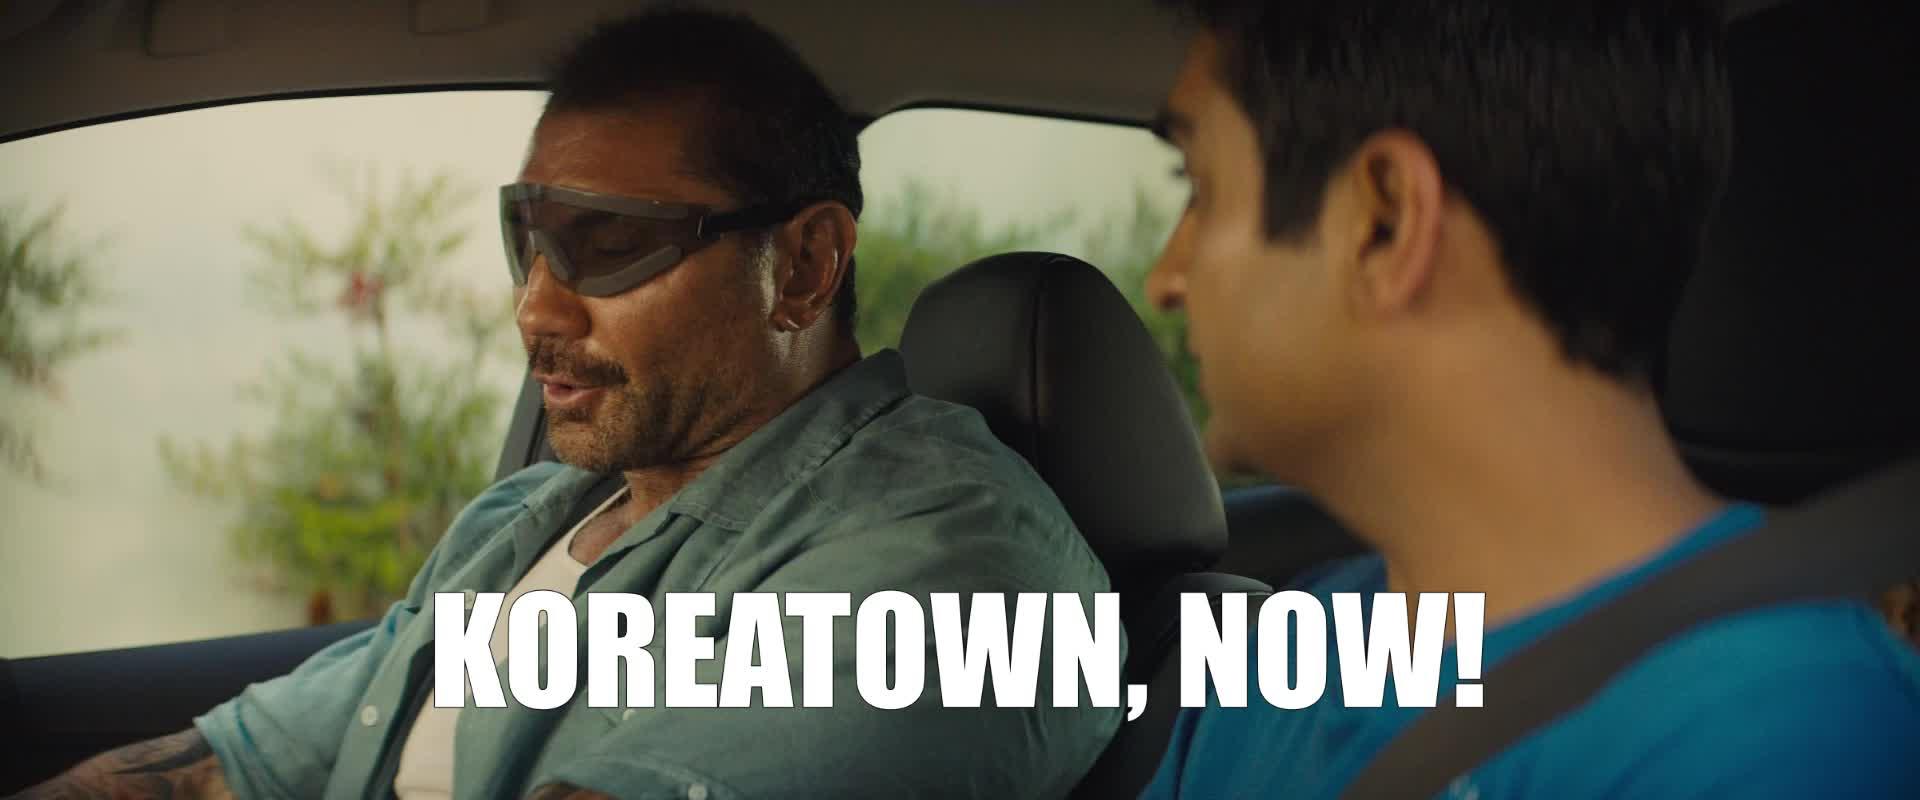 dave bautista, koreatown, stuber, stuber movie, uber, Dave Bautista Koreatown Now GIFs